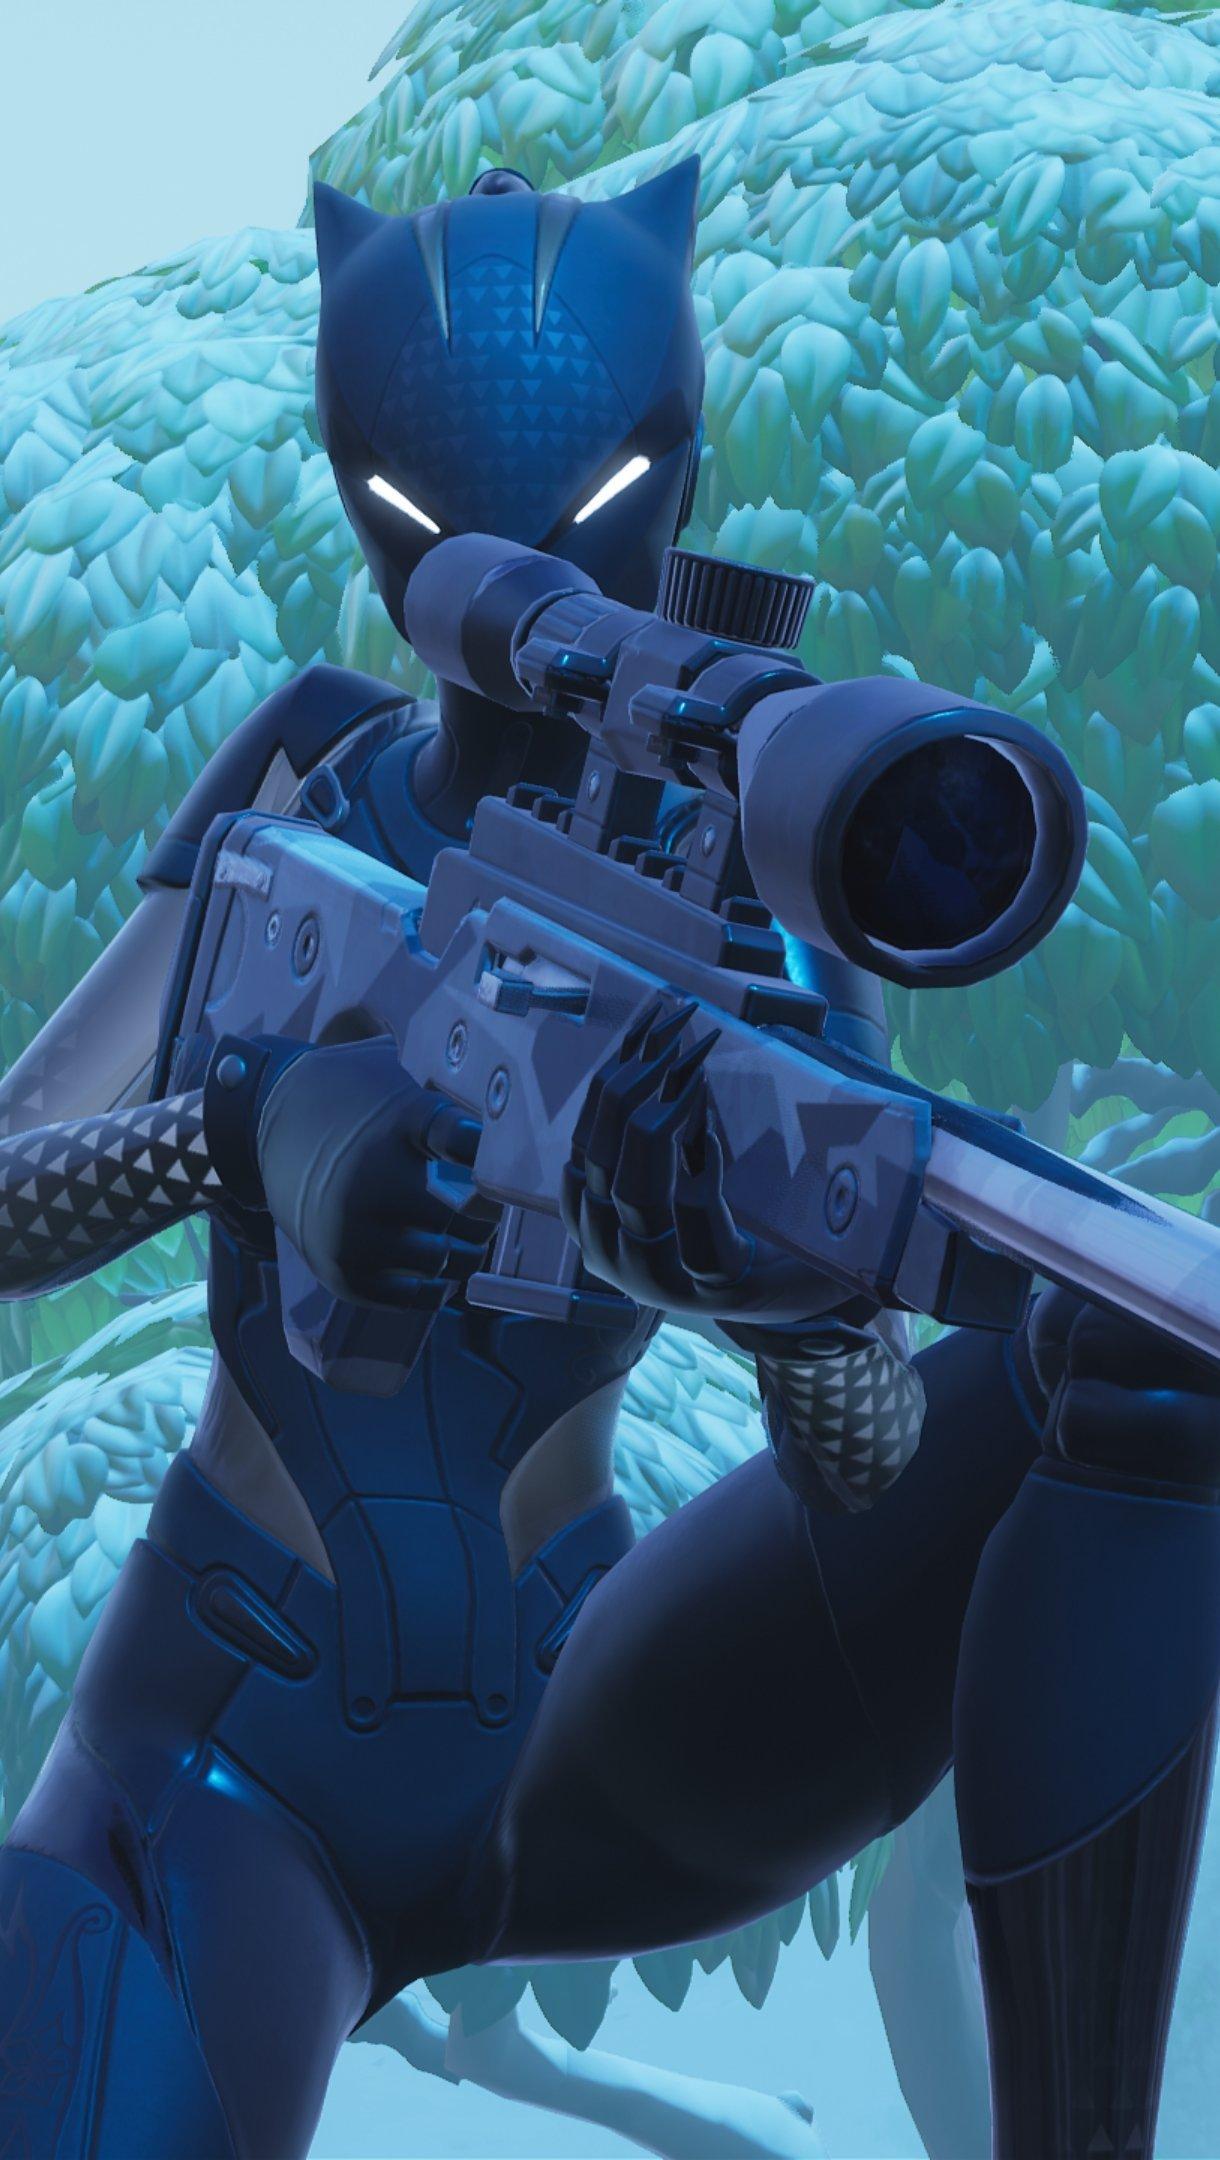 Fondos de pantalla Fortnite Lynx Black Edition Vertical